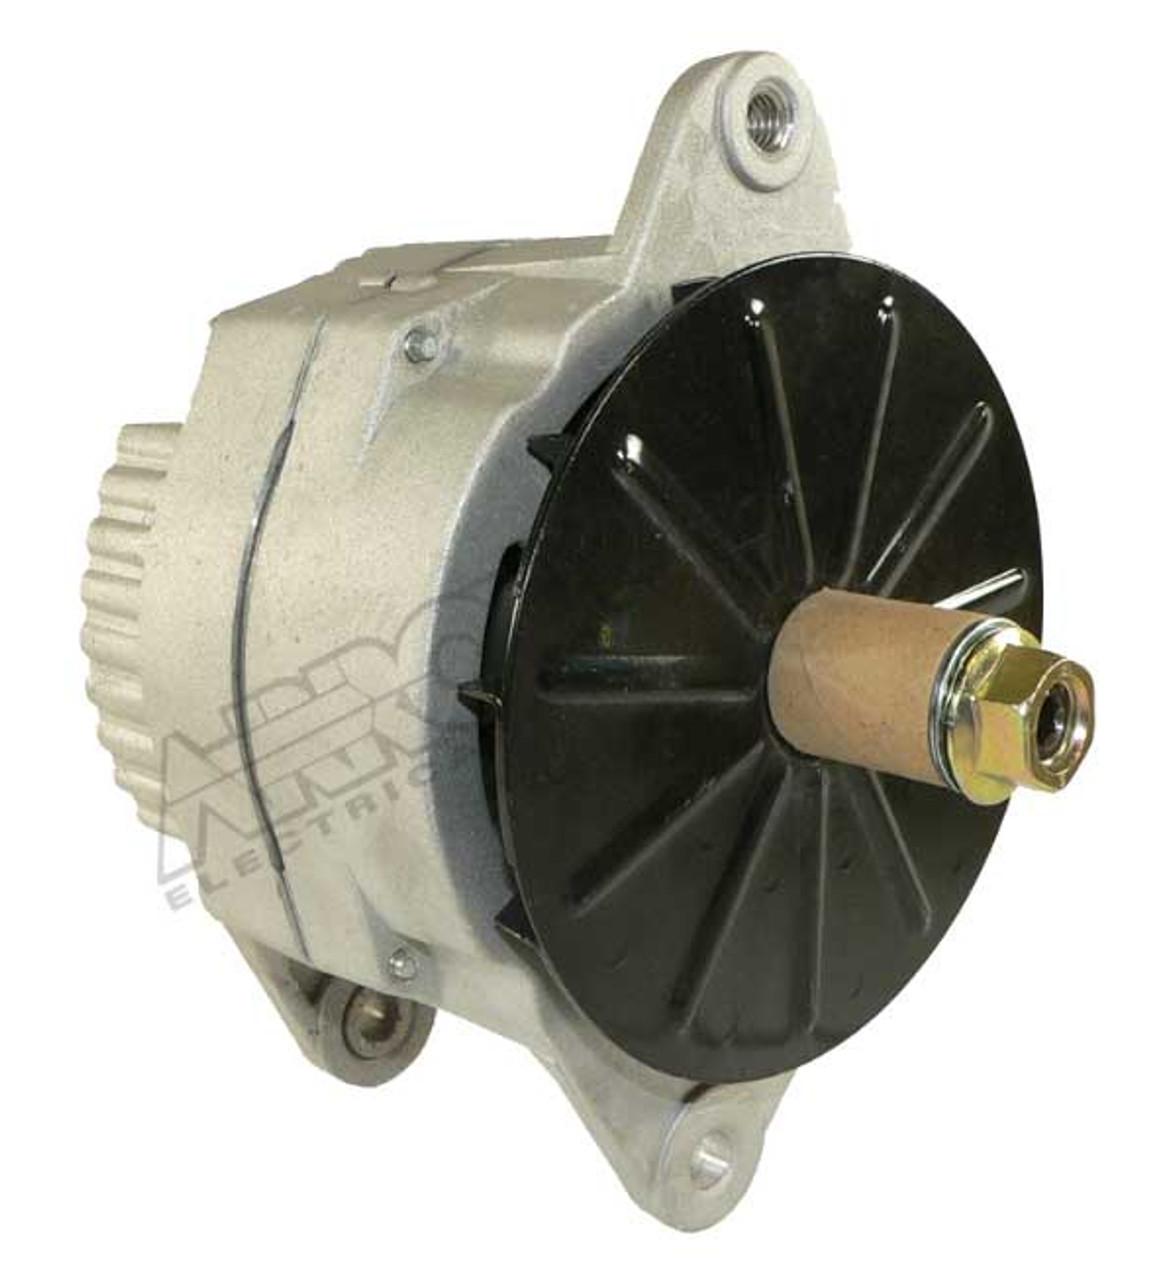 Alternator for 27SI Type 200 Series IR/EF, 24-Volt, 65 Amp